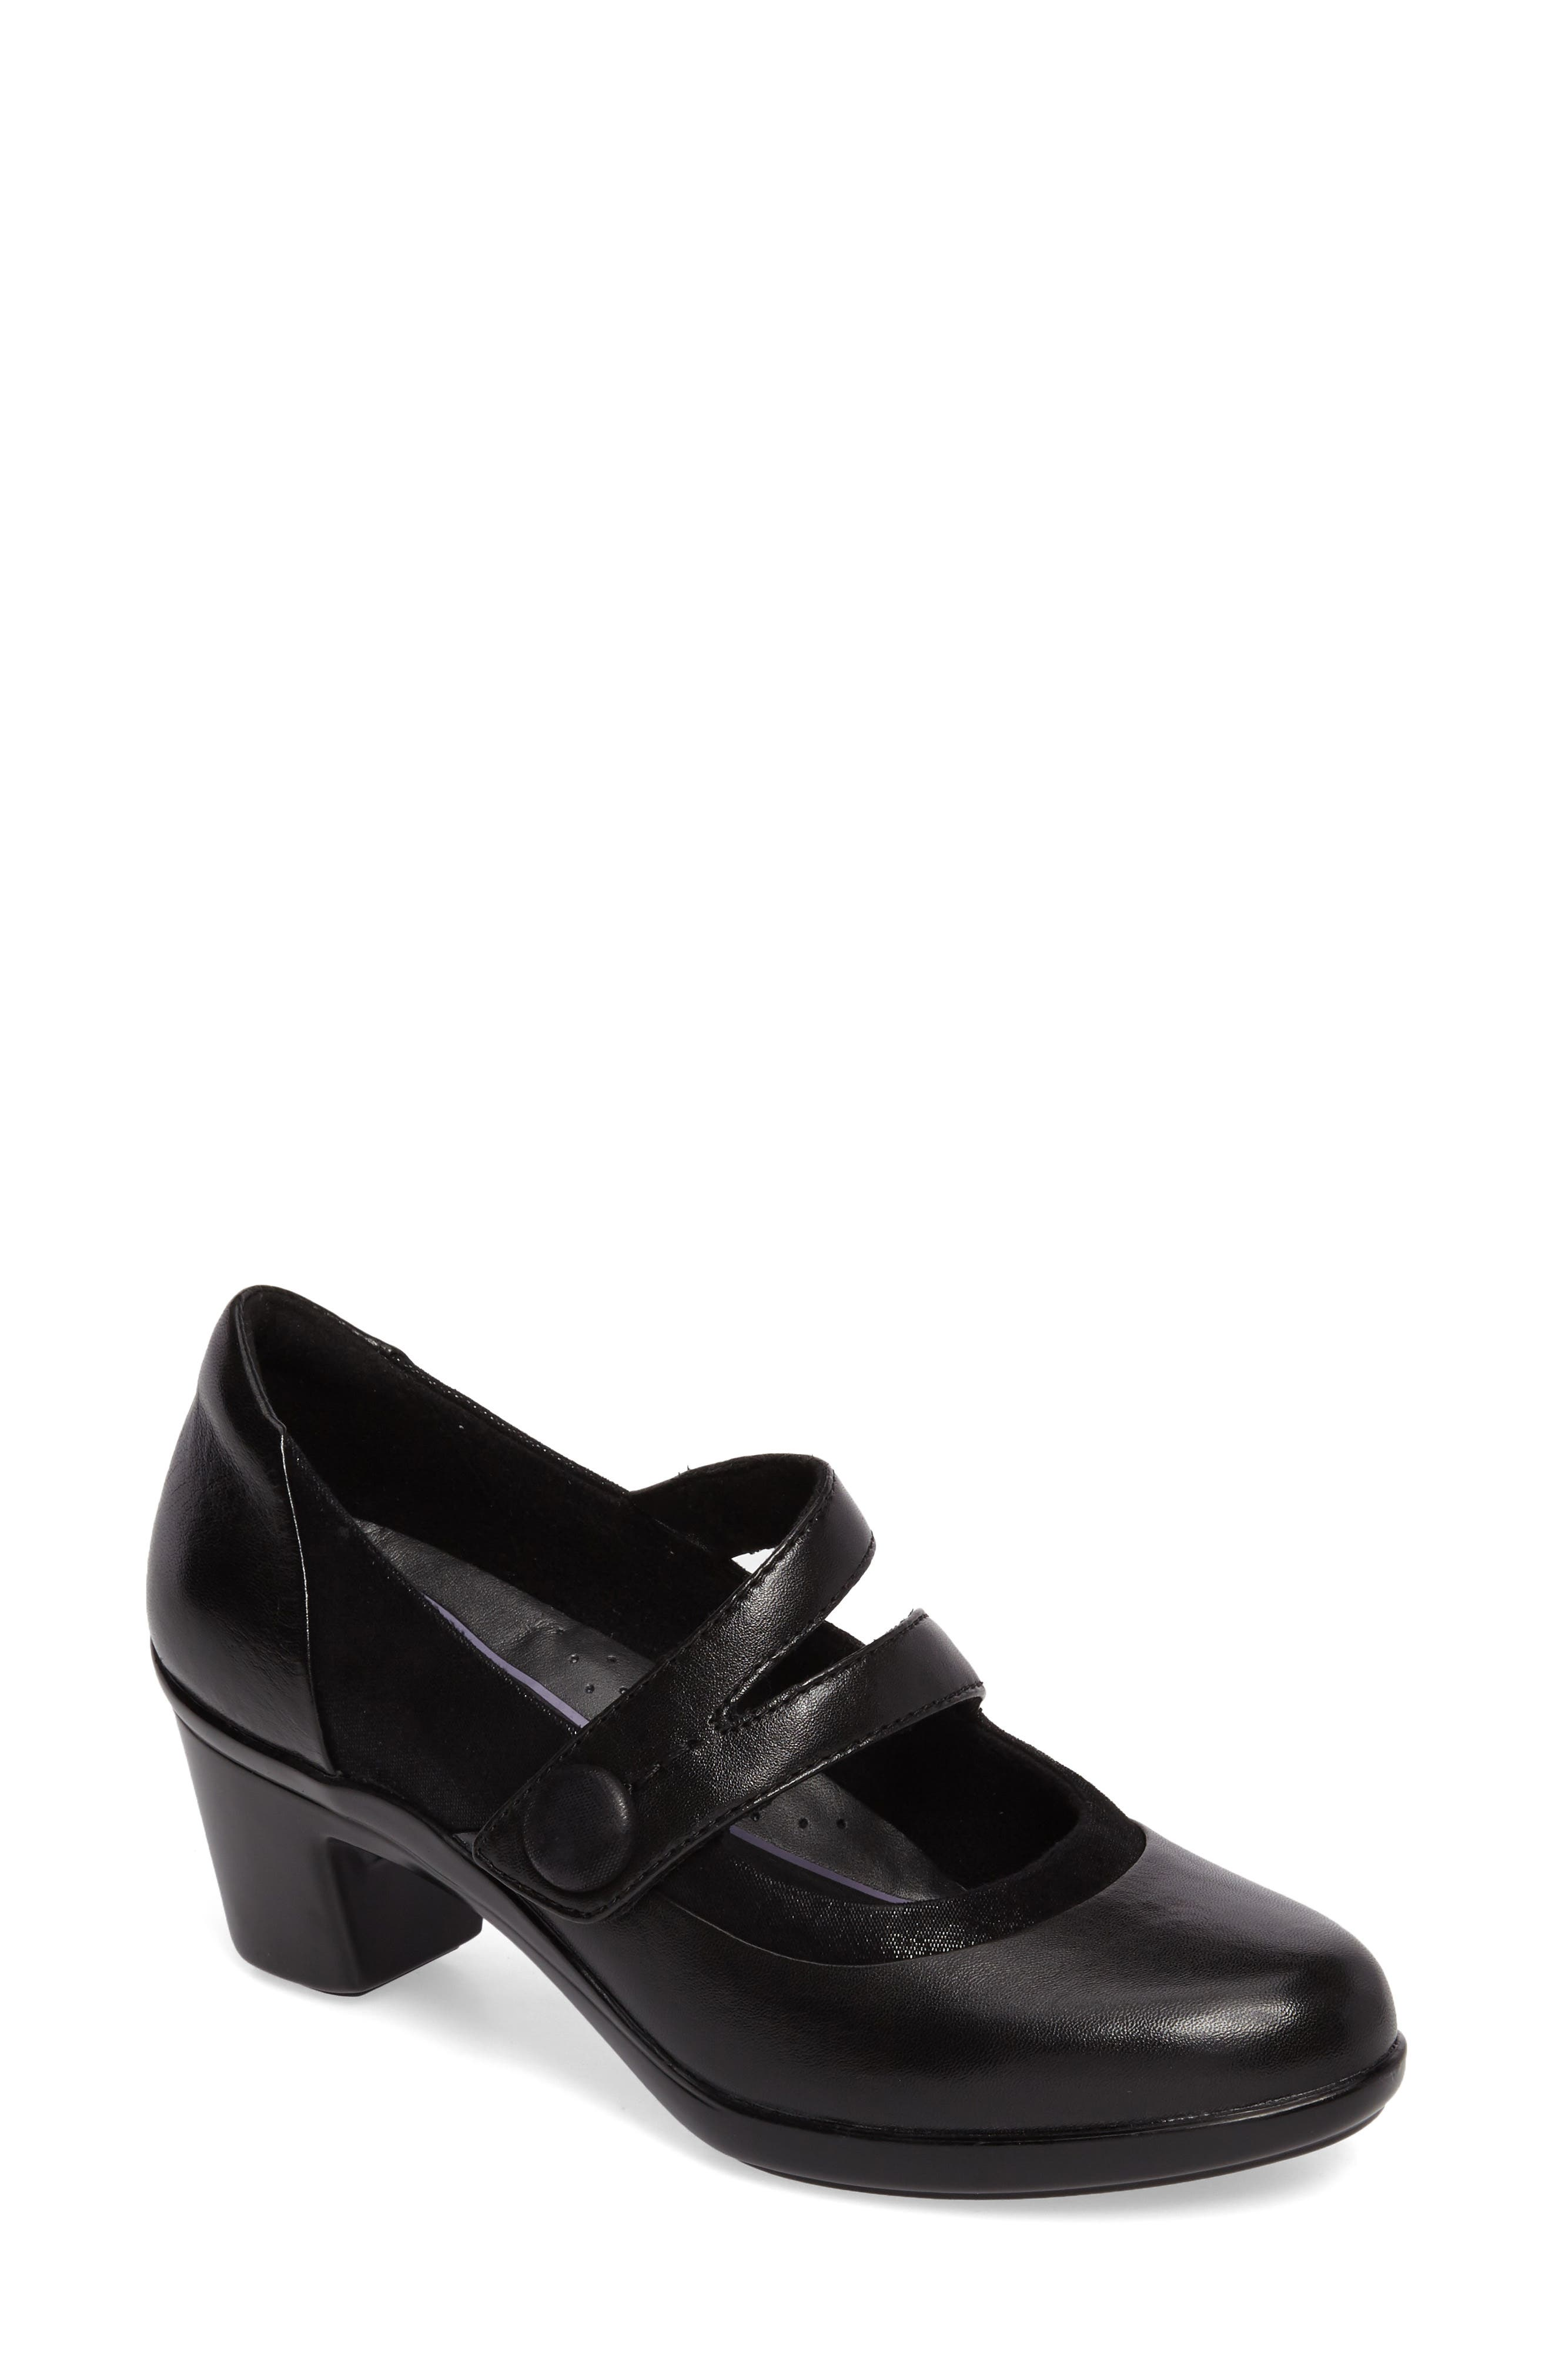 Lexee Mary Jane Pump,                         Main,                         color, Black Leather